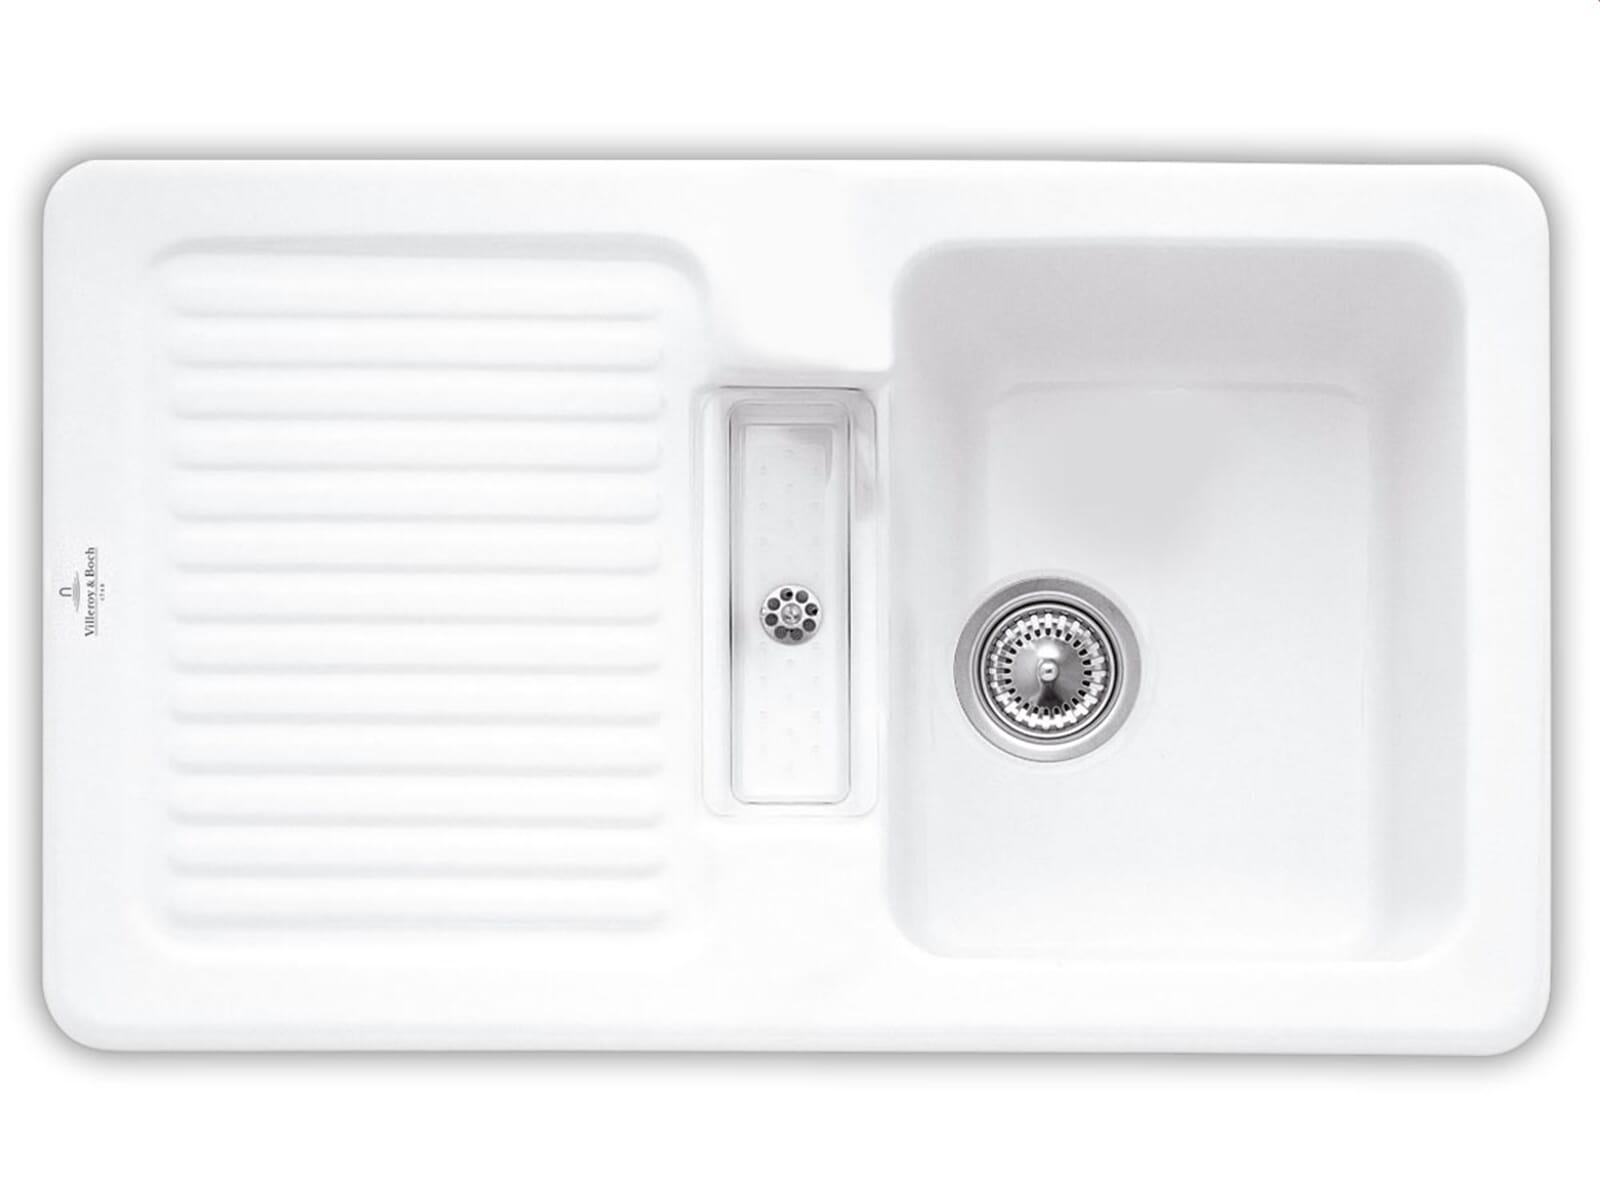 villeroy boch condor 50 snow white keramik sp le f r 438 90 eur. Black Bedroom Furniture Sets. Home Design Ideas